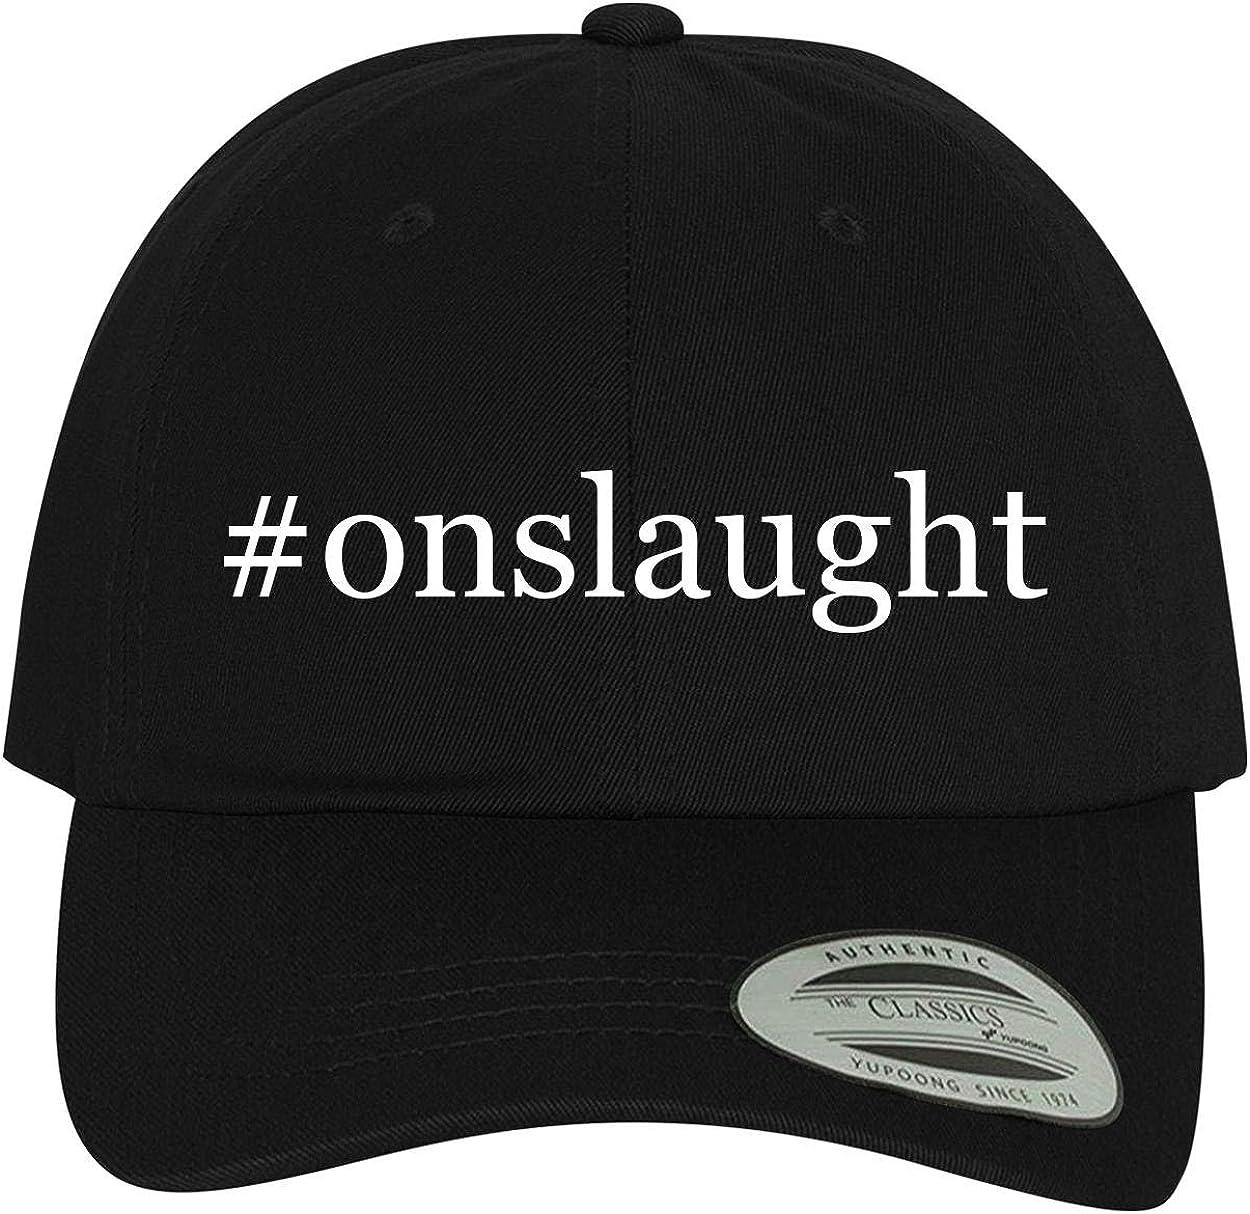 Comfortable Dad Hat Baseball Cap BH Cool Designs #Onslaught